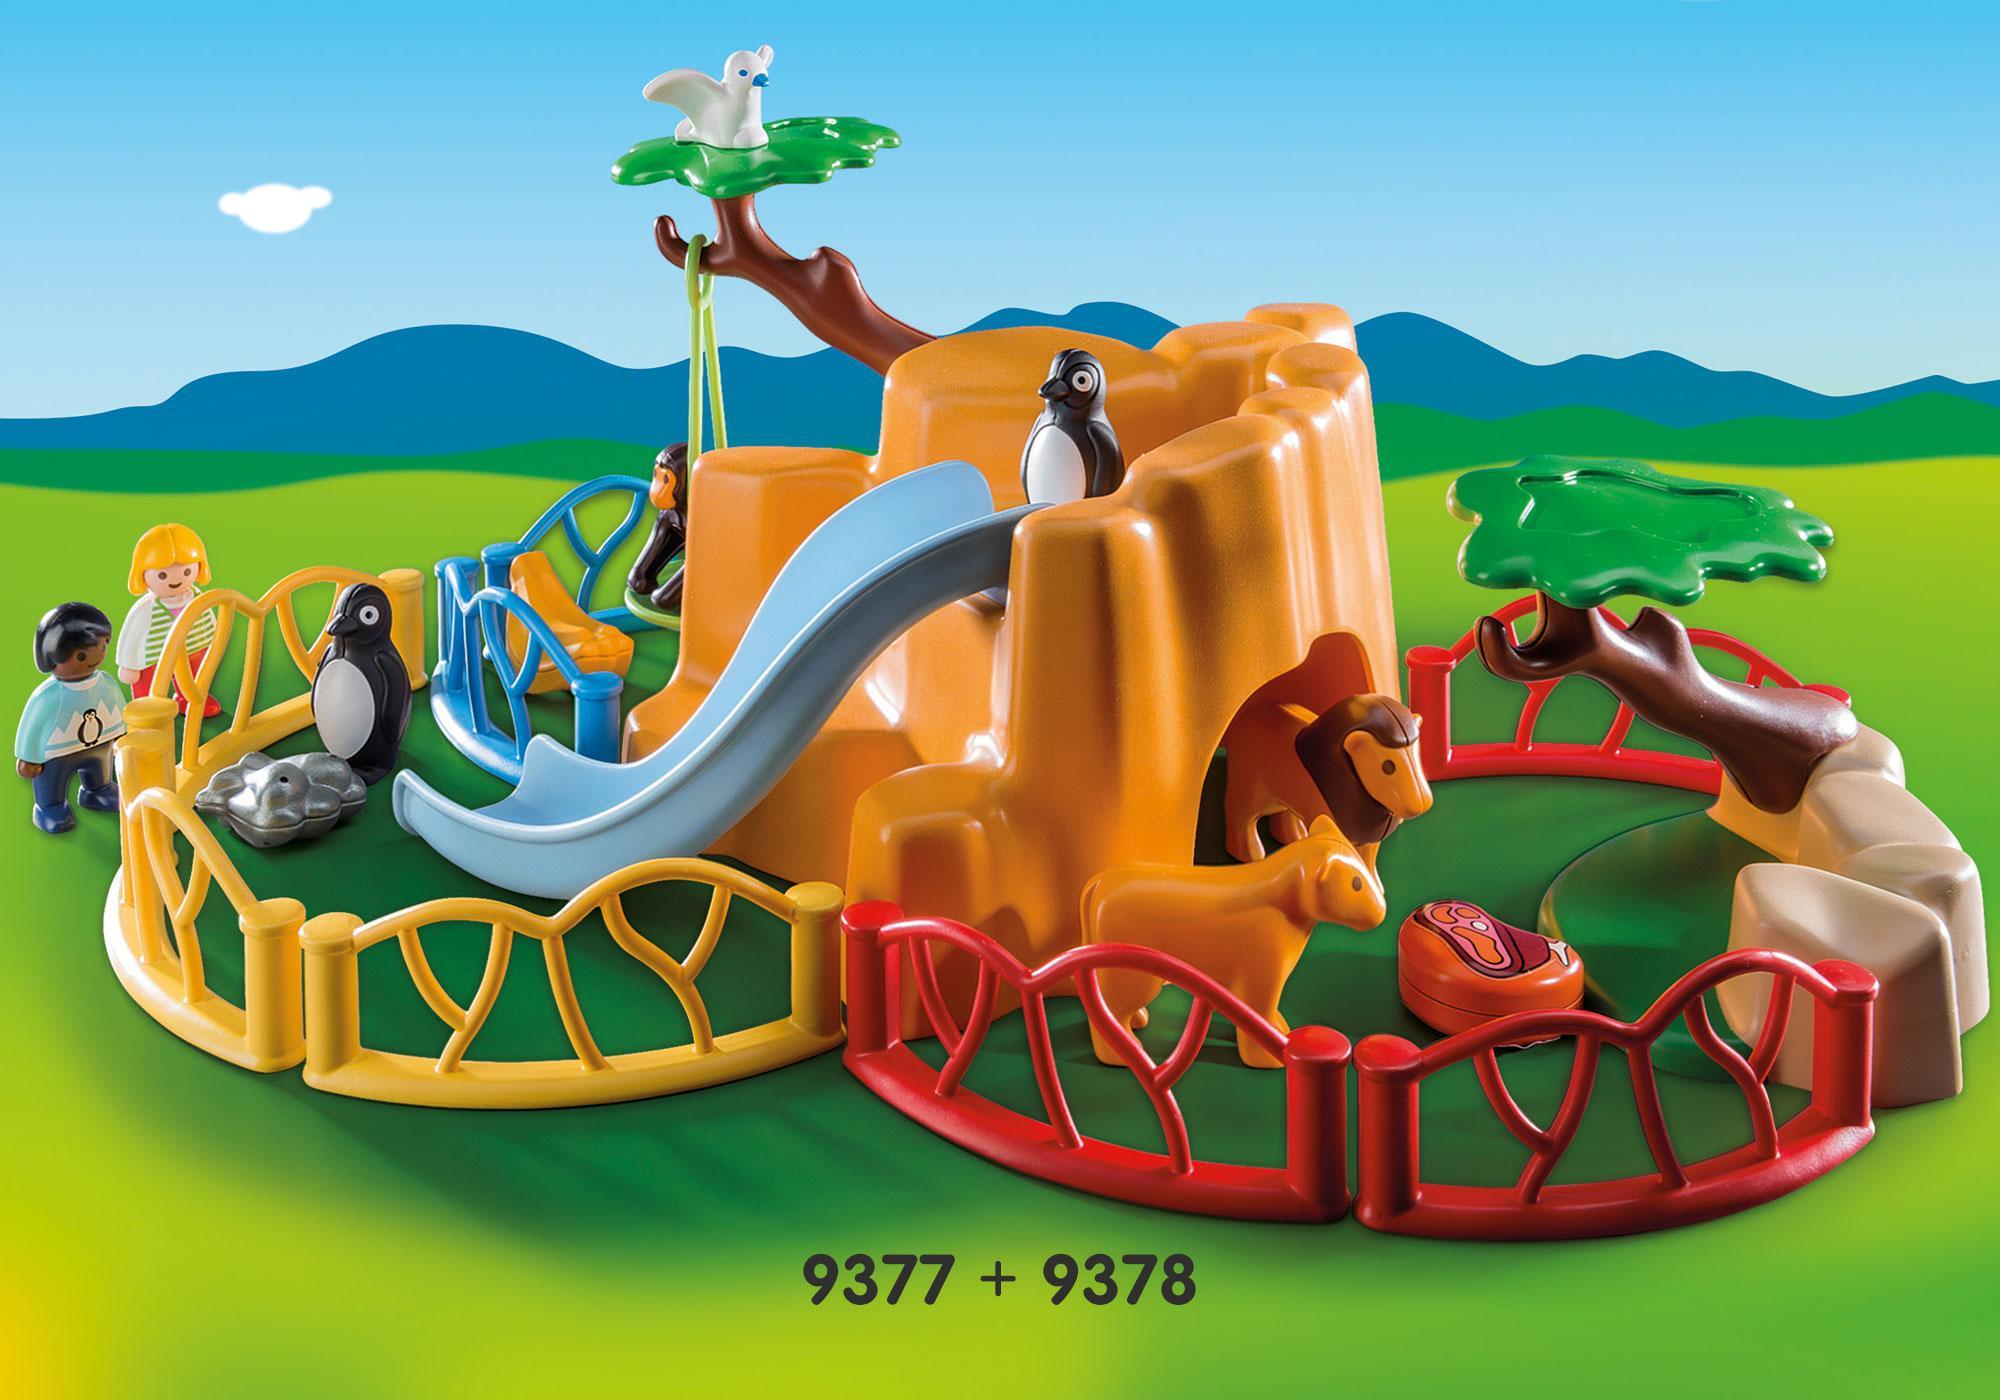 http://media.playmobil.com/i/playmobil/9377_product_extra1/1.2.3 Zoo